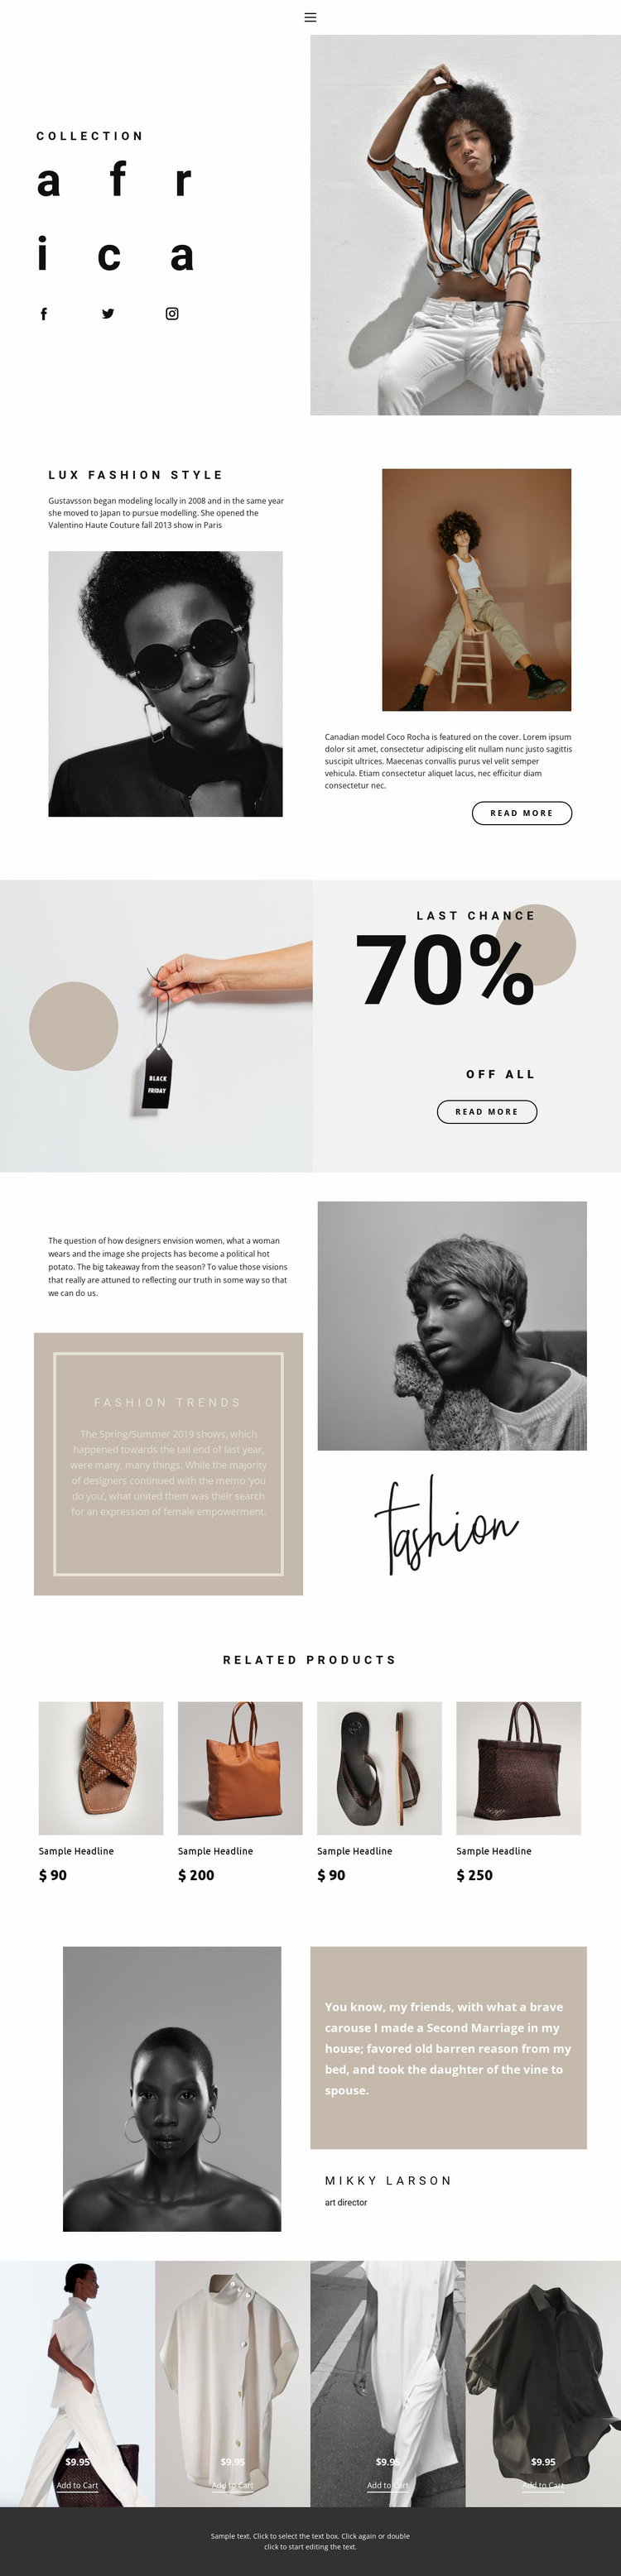 Fashion ideas and advance Website Design